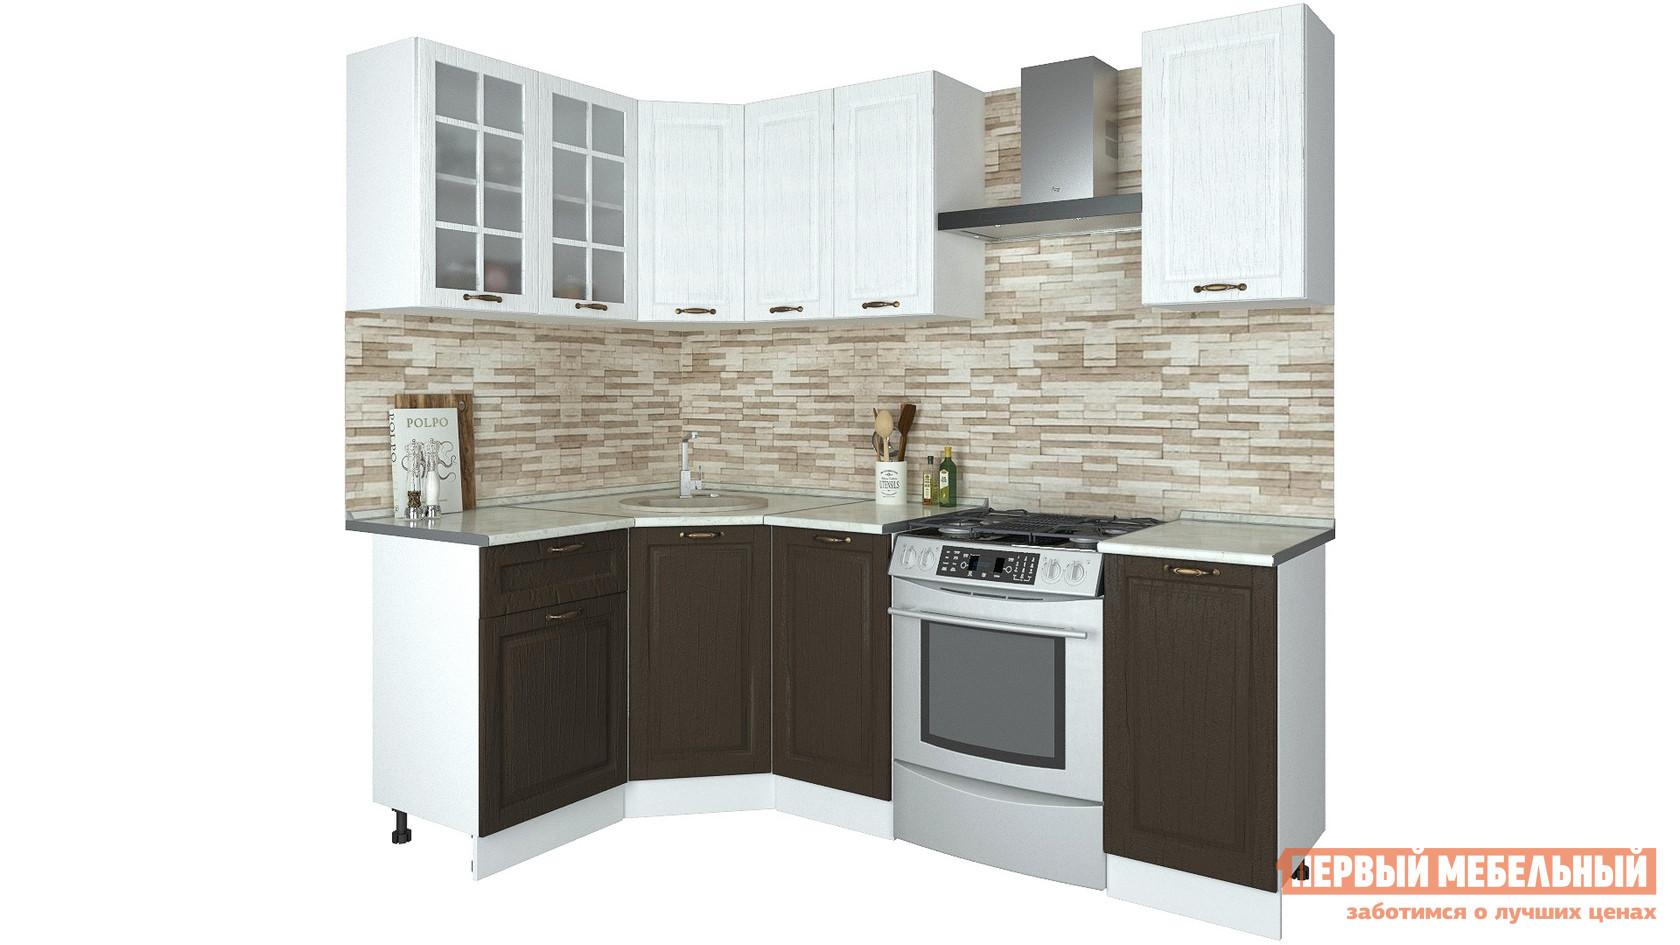 Угловой кухонный гарнитур Первый Мебельный Кухня Палермо 1,65х1,35 м